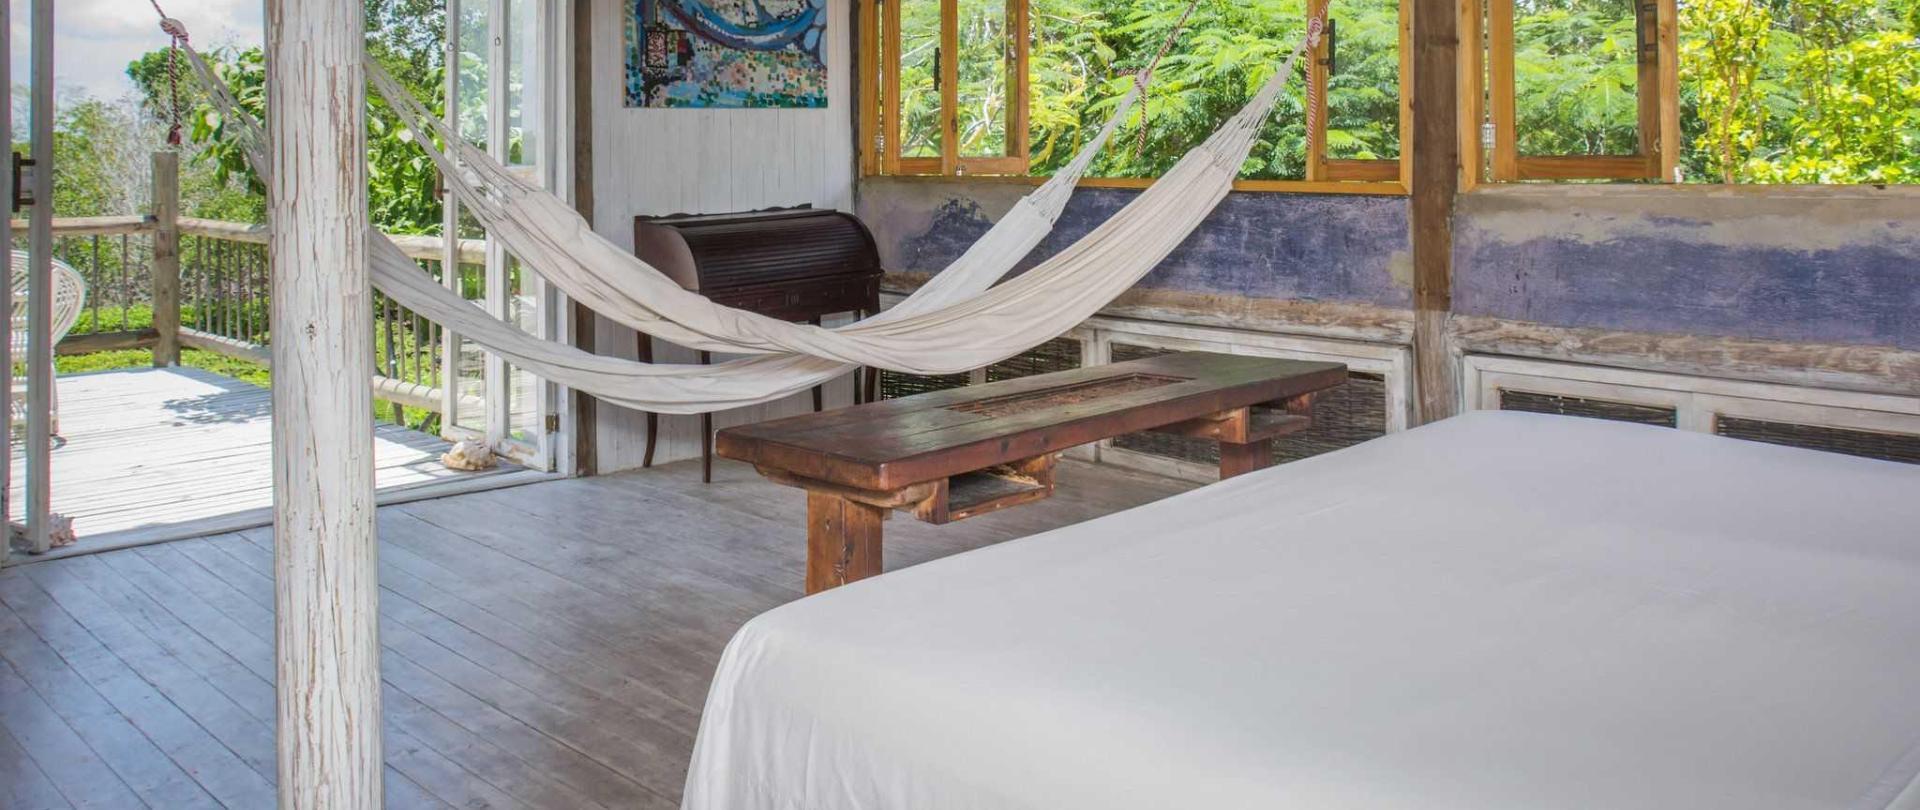 hotel-playa-manglares-19-1.jpg